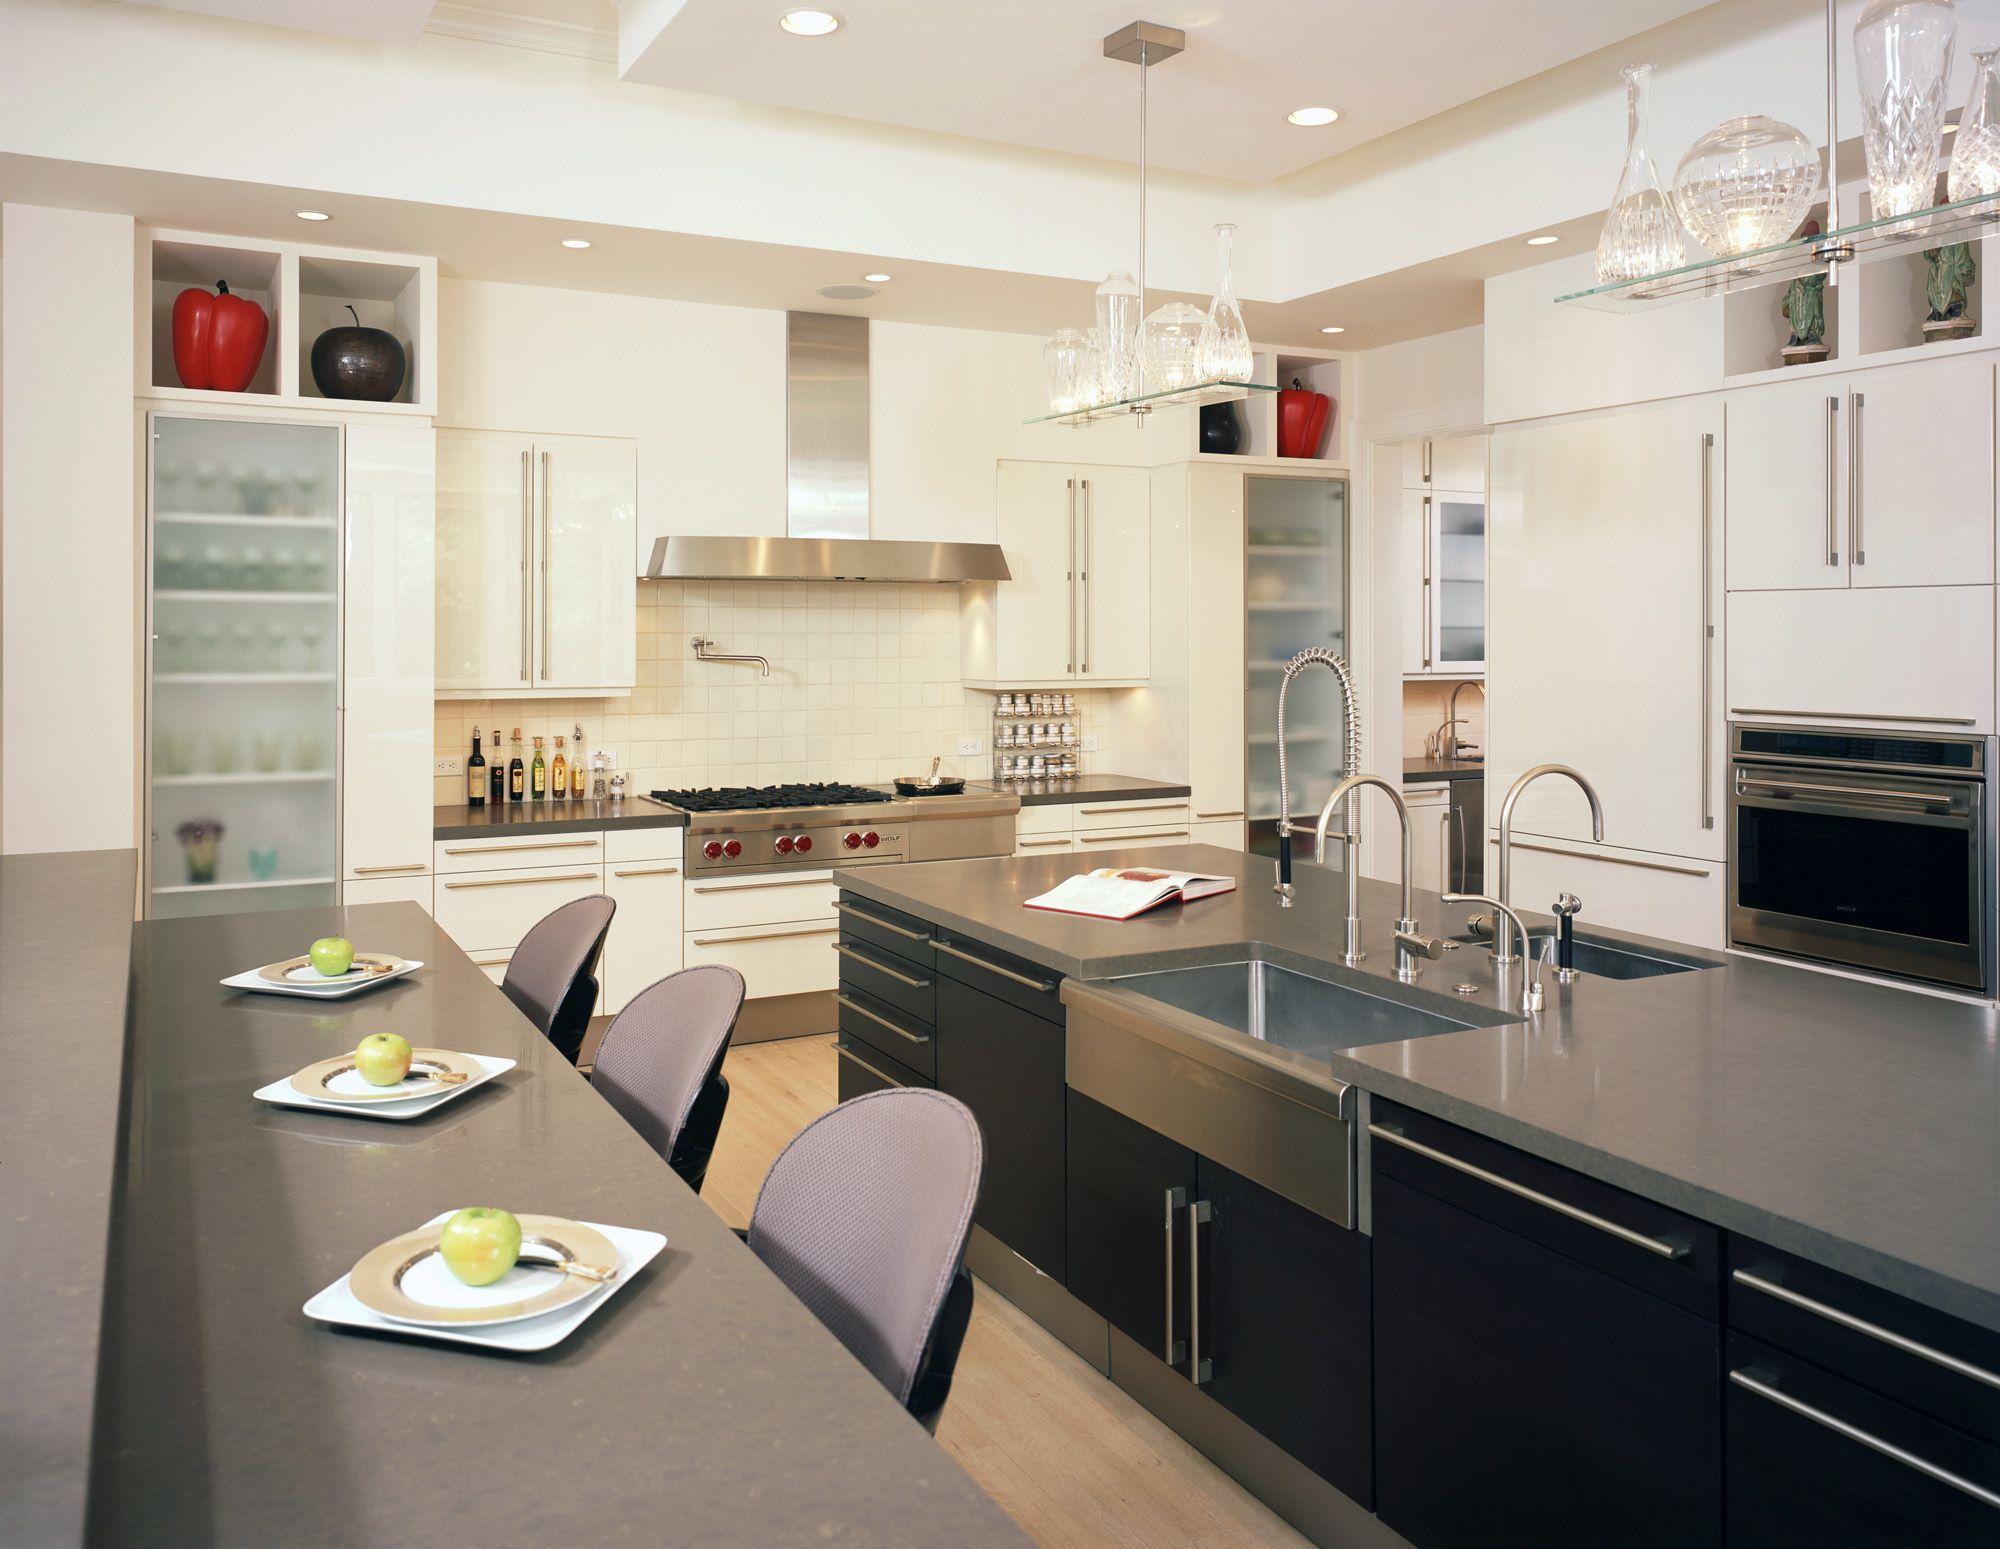 Rosen Residence Kitchen http://www.landrydesigngroup.com/#/portfolio/modern/1831